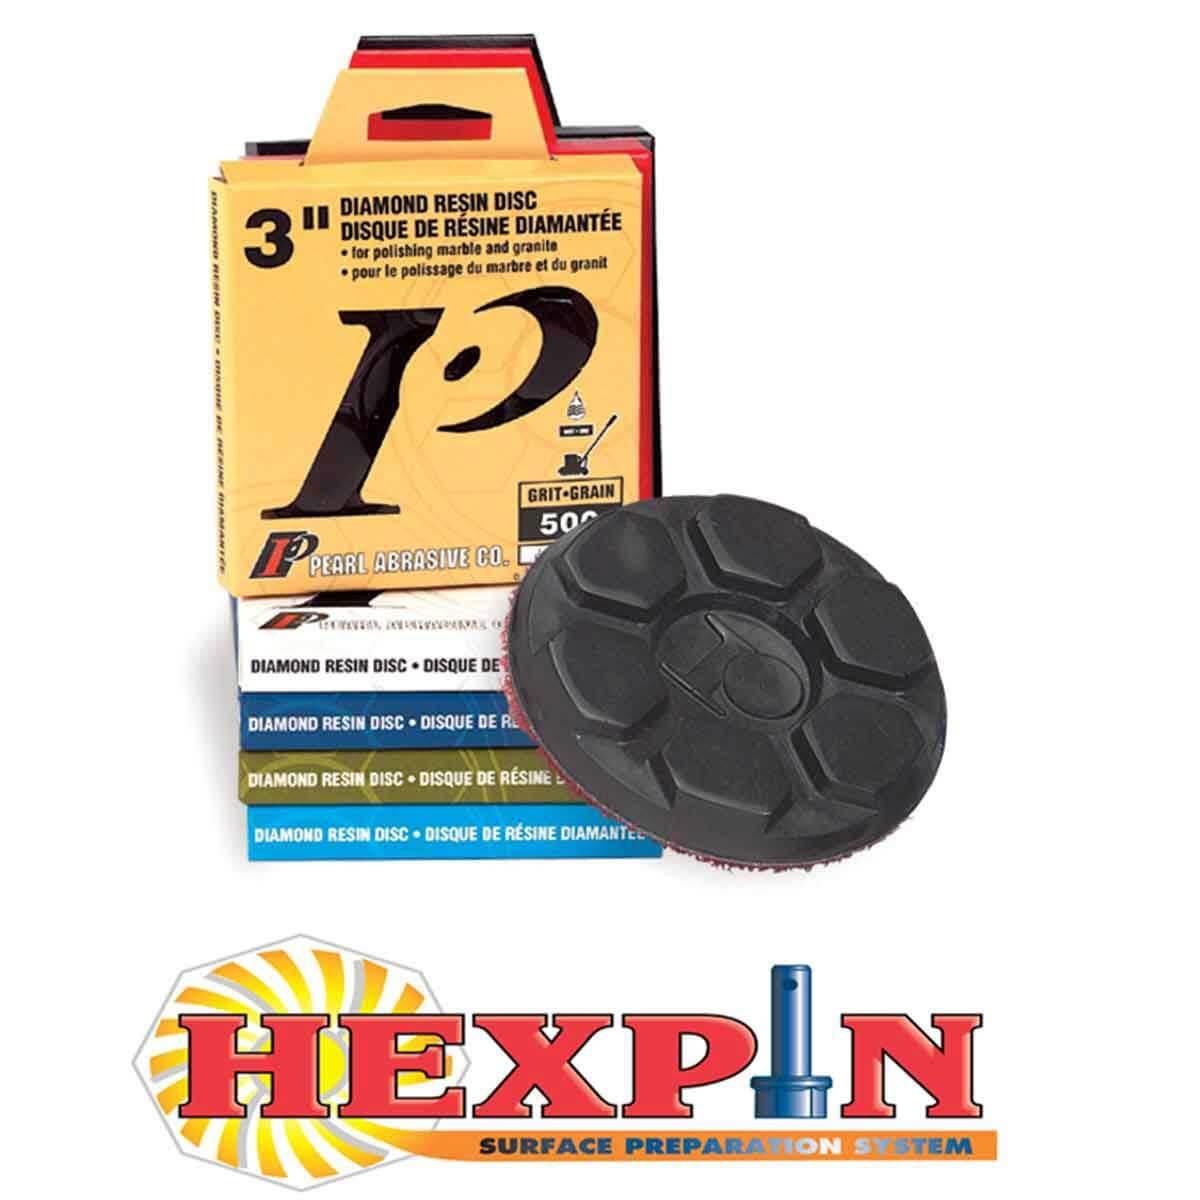 Pearl Abrasive Hexpin Diamond Disc